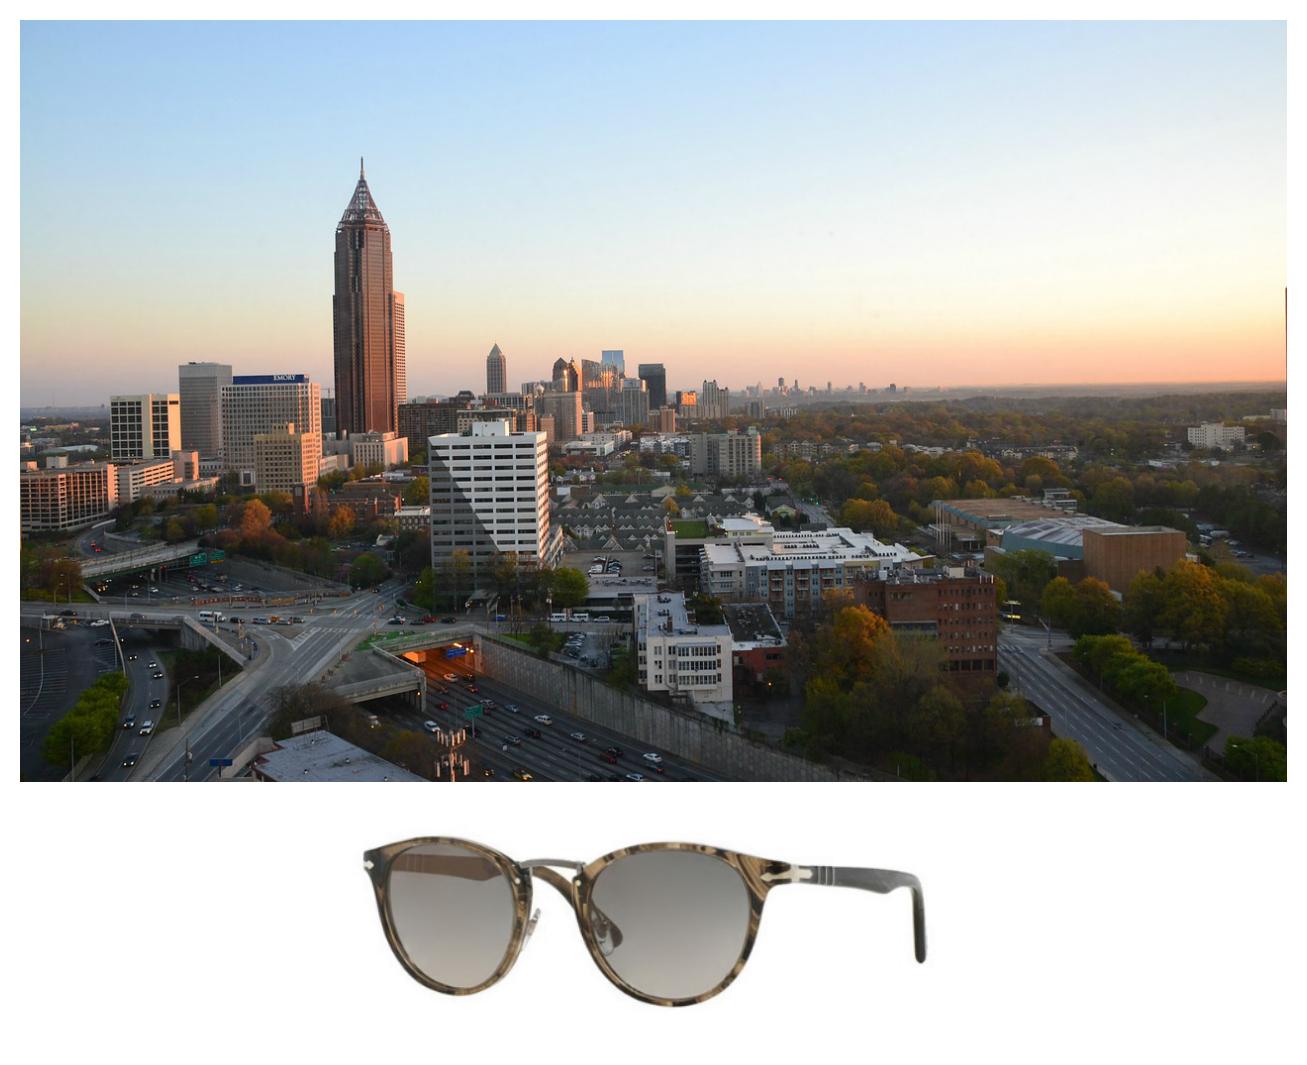 ebeb5499f58b Designer Sunnies For Your City Break - Our Top Picks